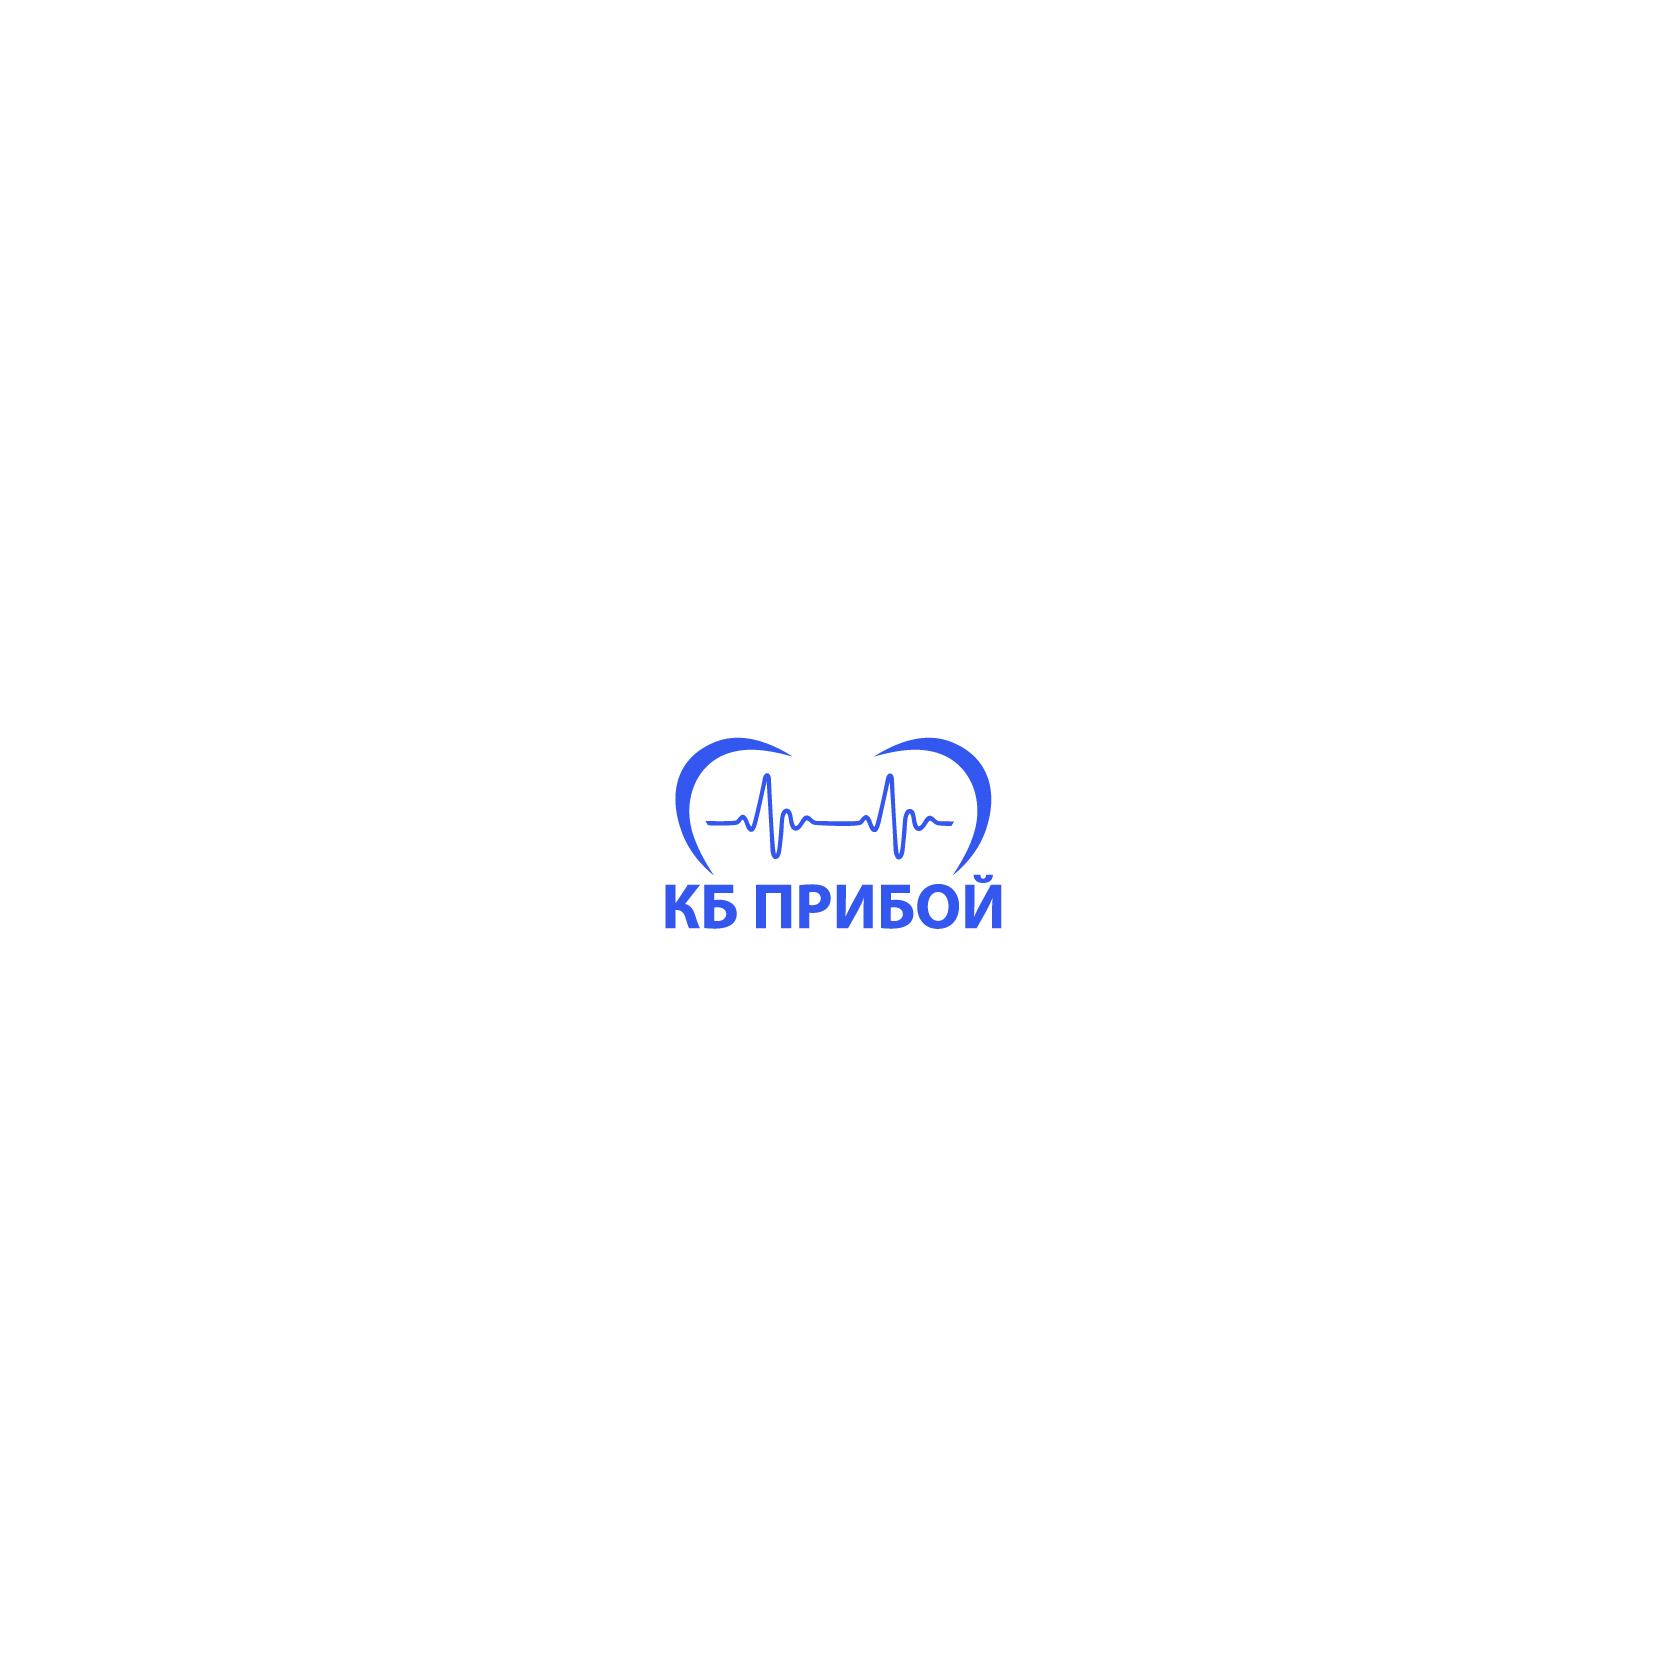 Разработка логотипа и фирменного стиля для КБ Прибой фото f_5845b2209772c275.jpg